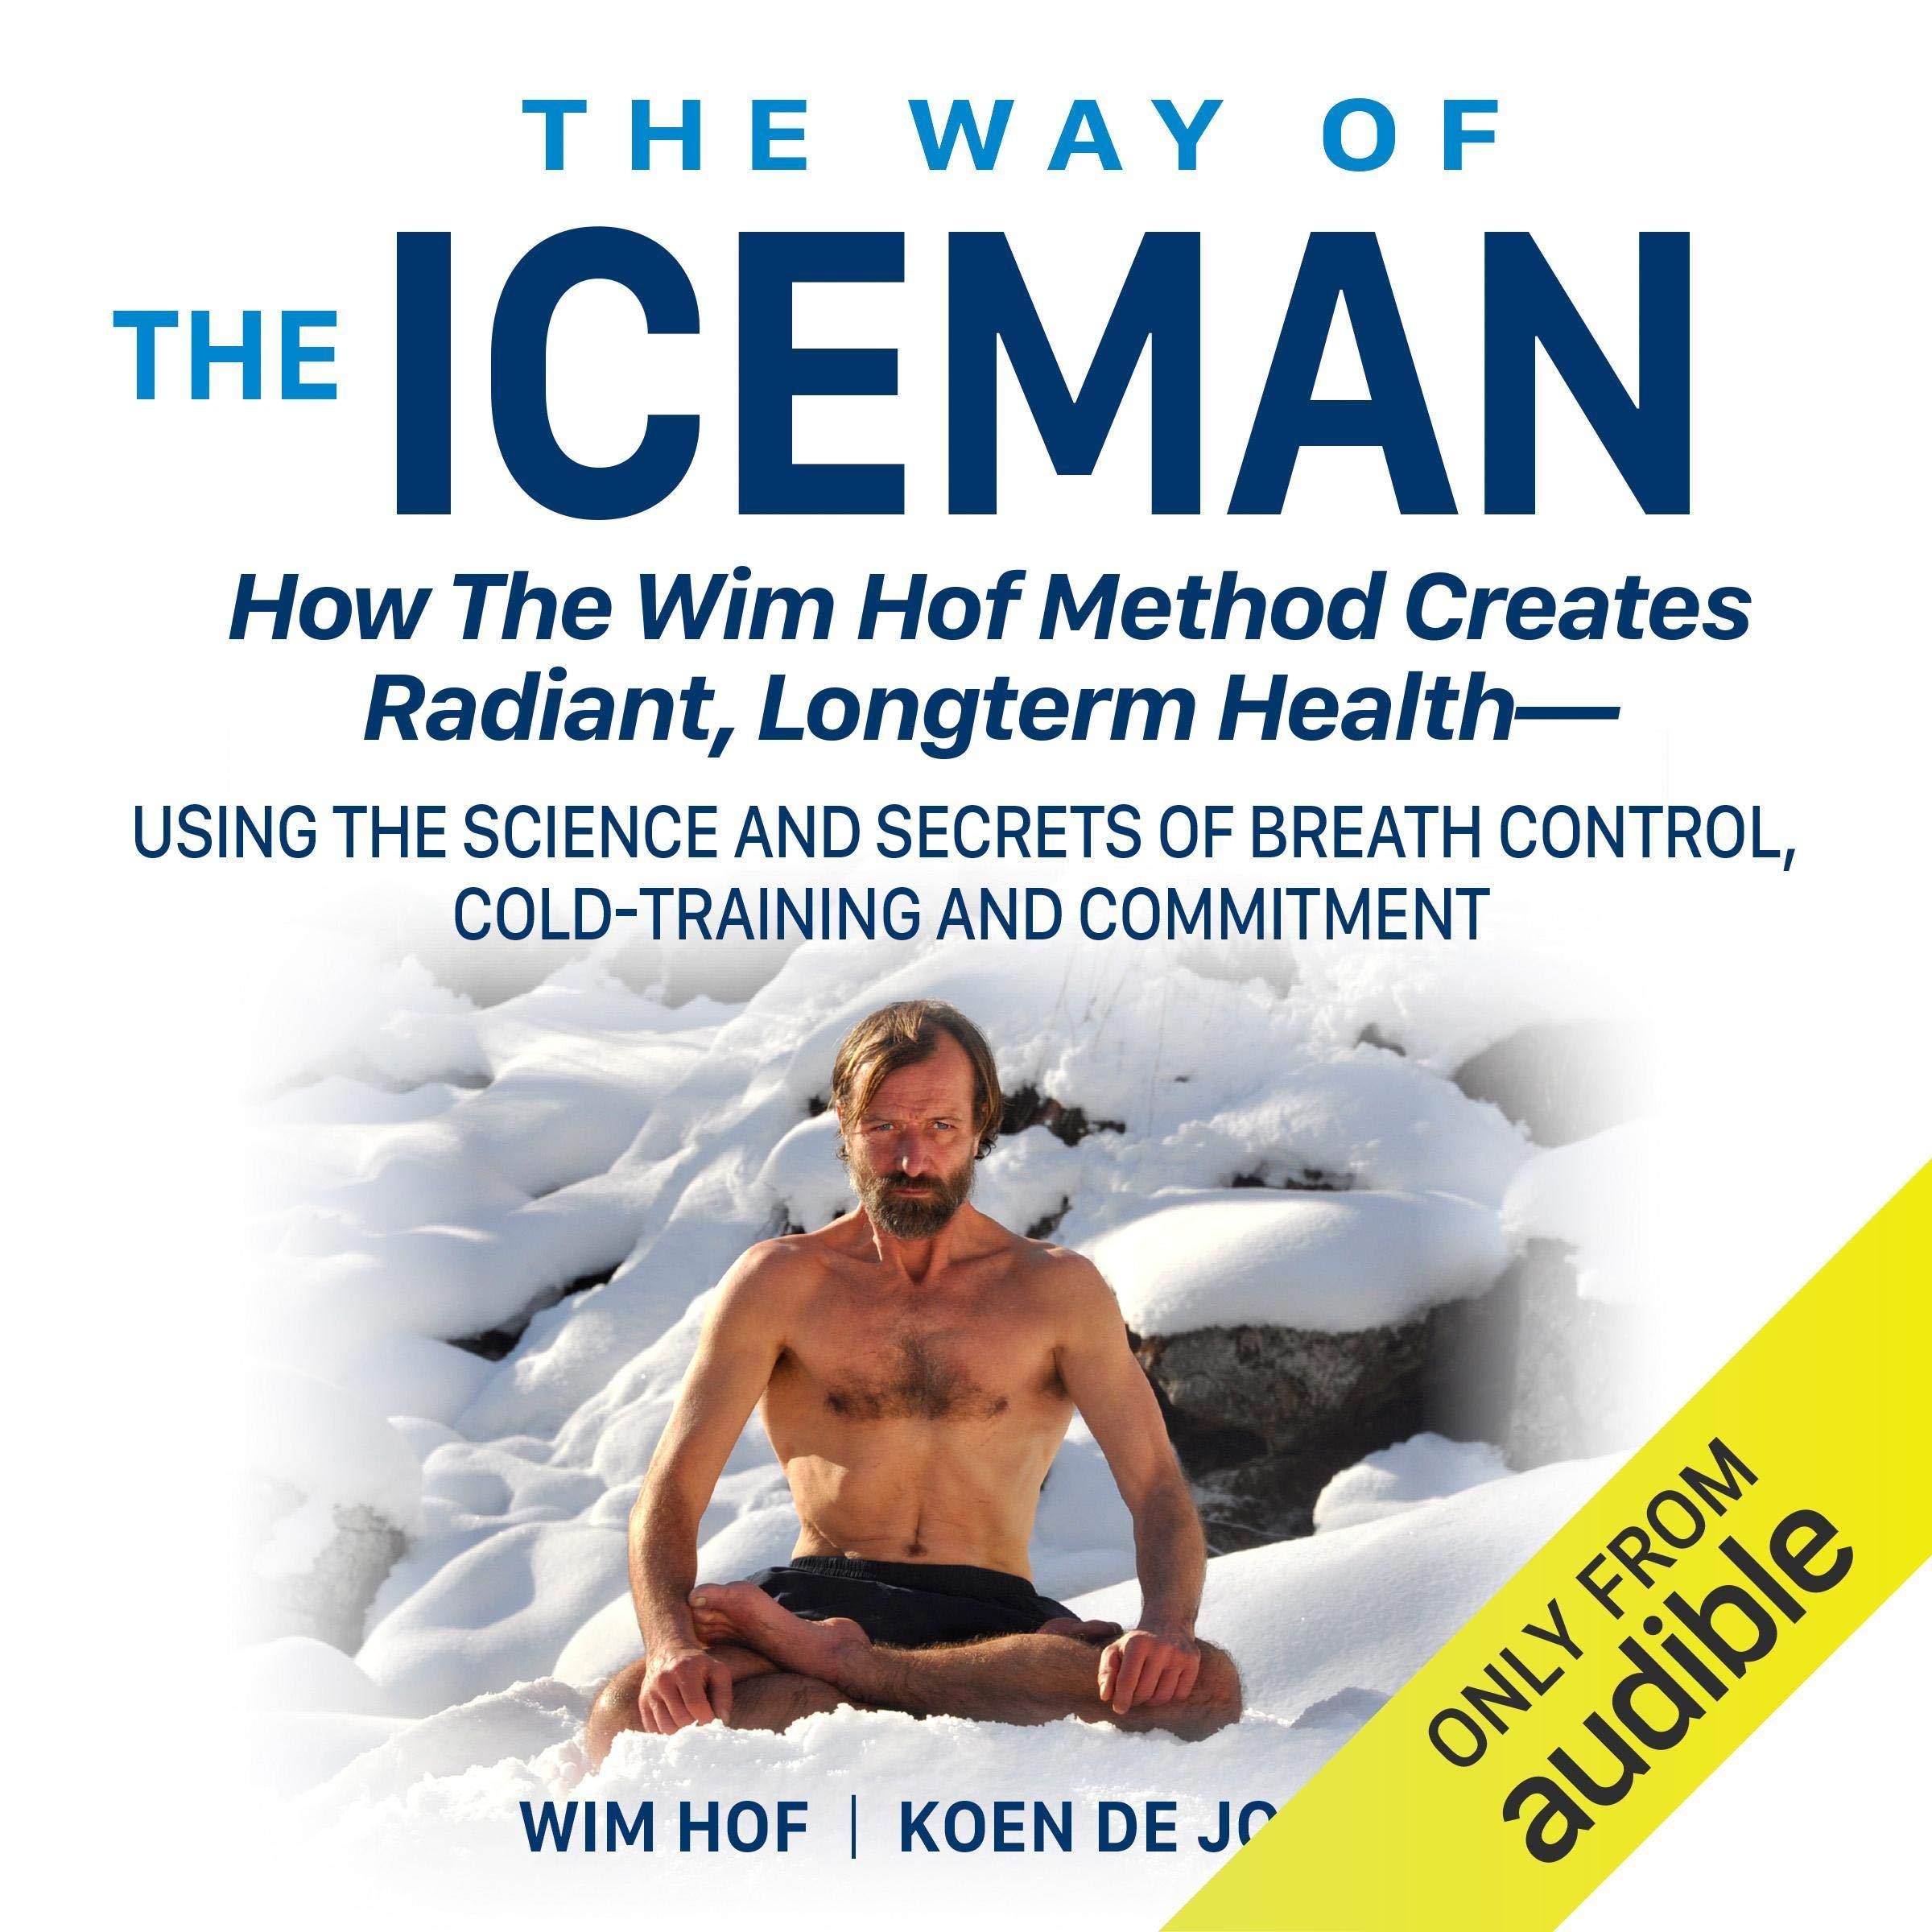 The Way Of The Iceman  How The Wim Hof Method Creates Radiant Longterm Health